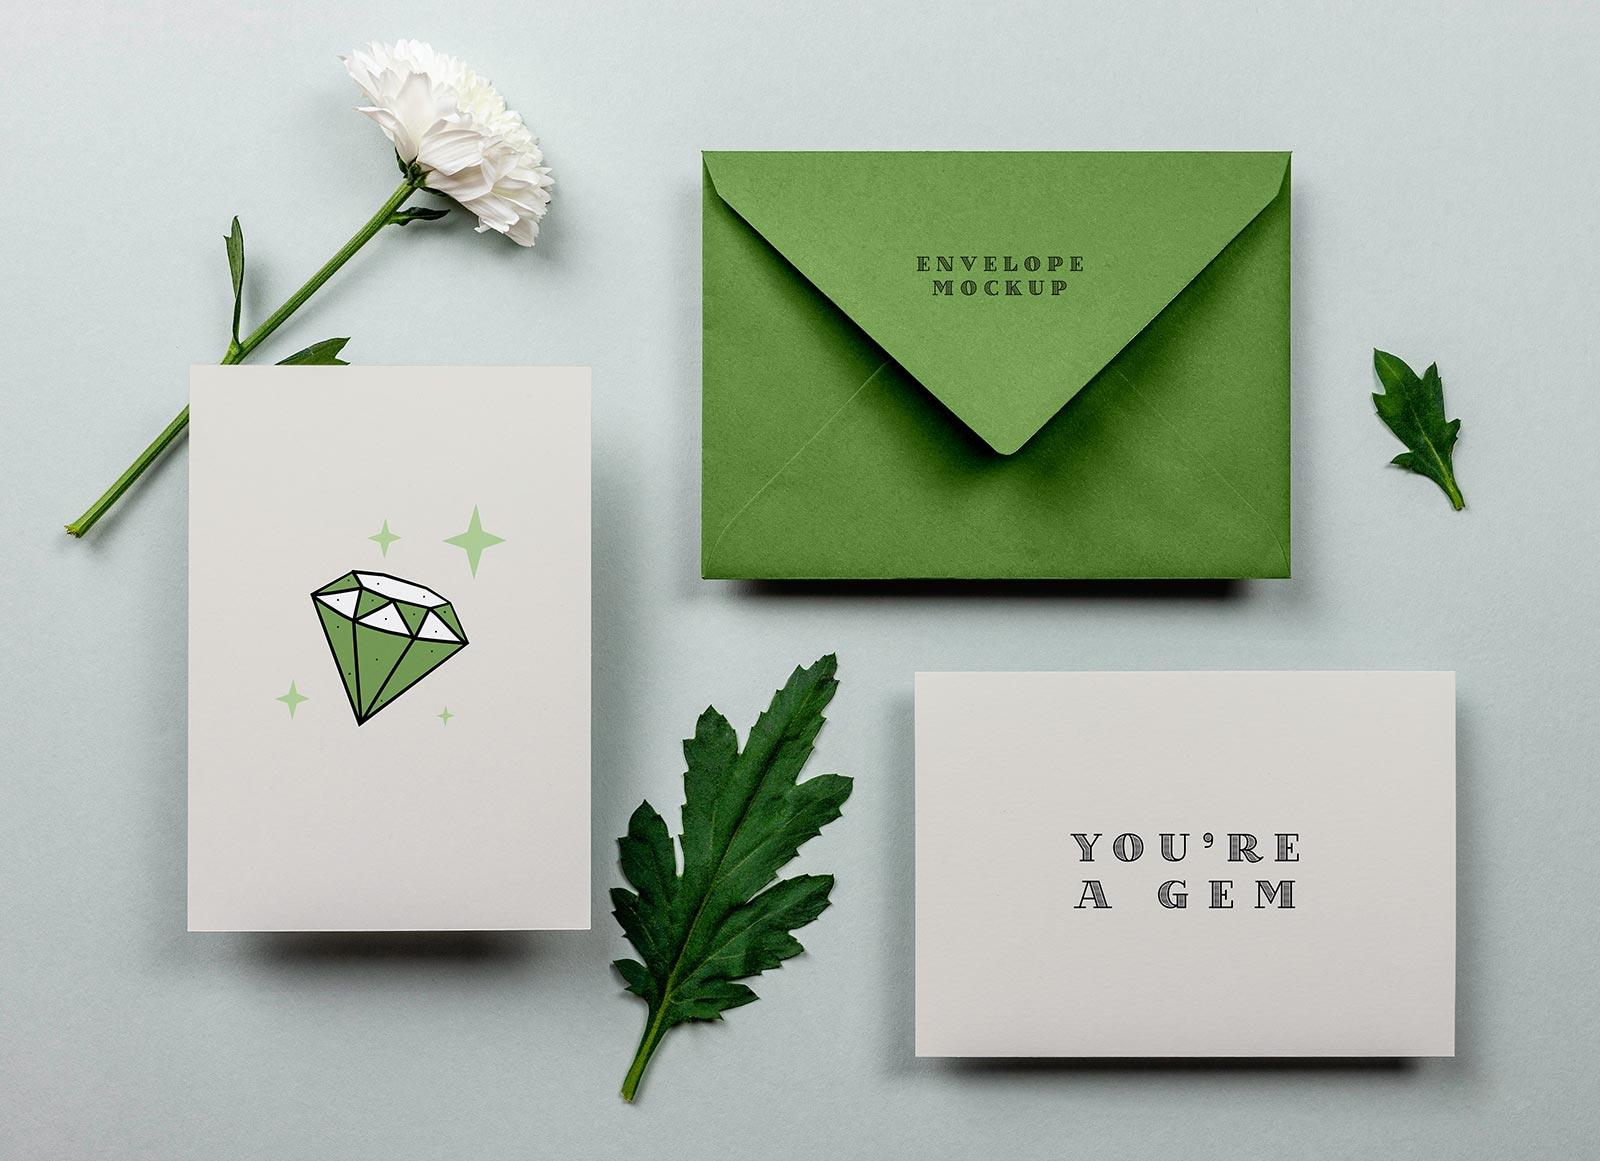 Free-Greeting-Card-&-Envelope-Mockup-PSD